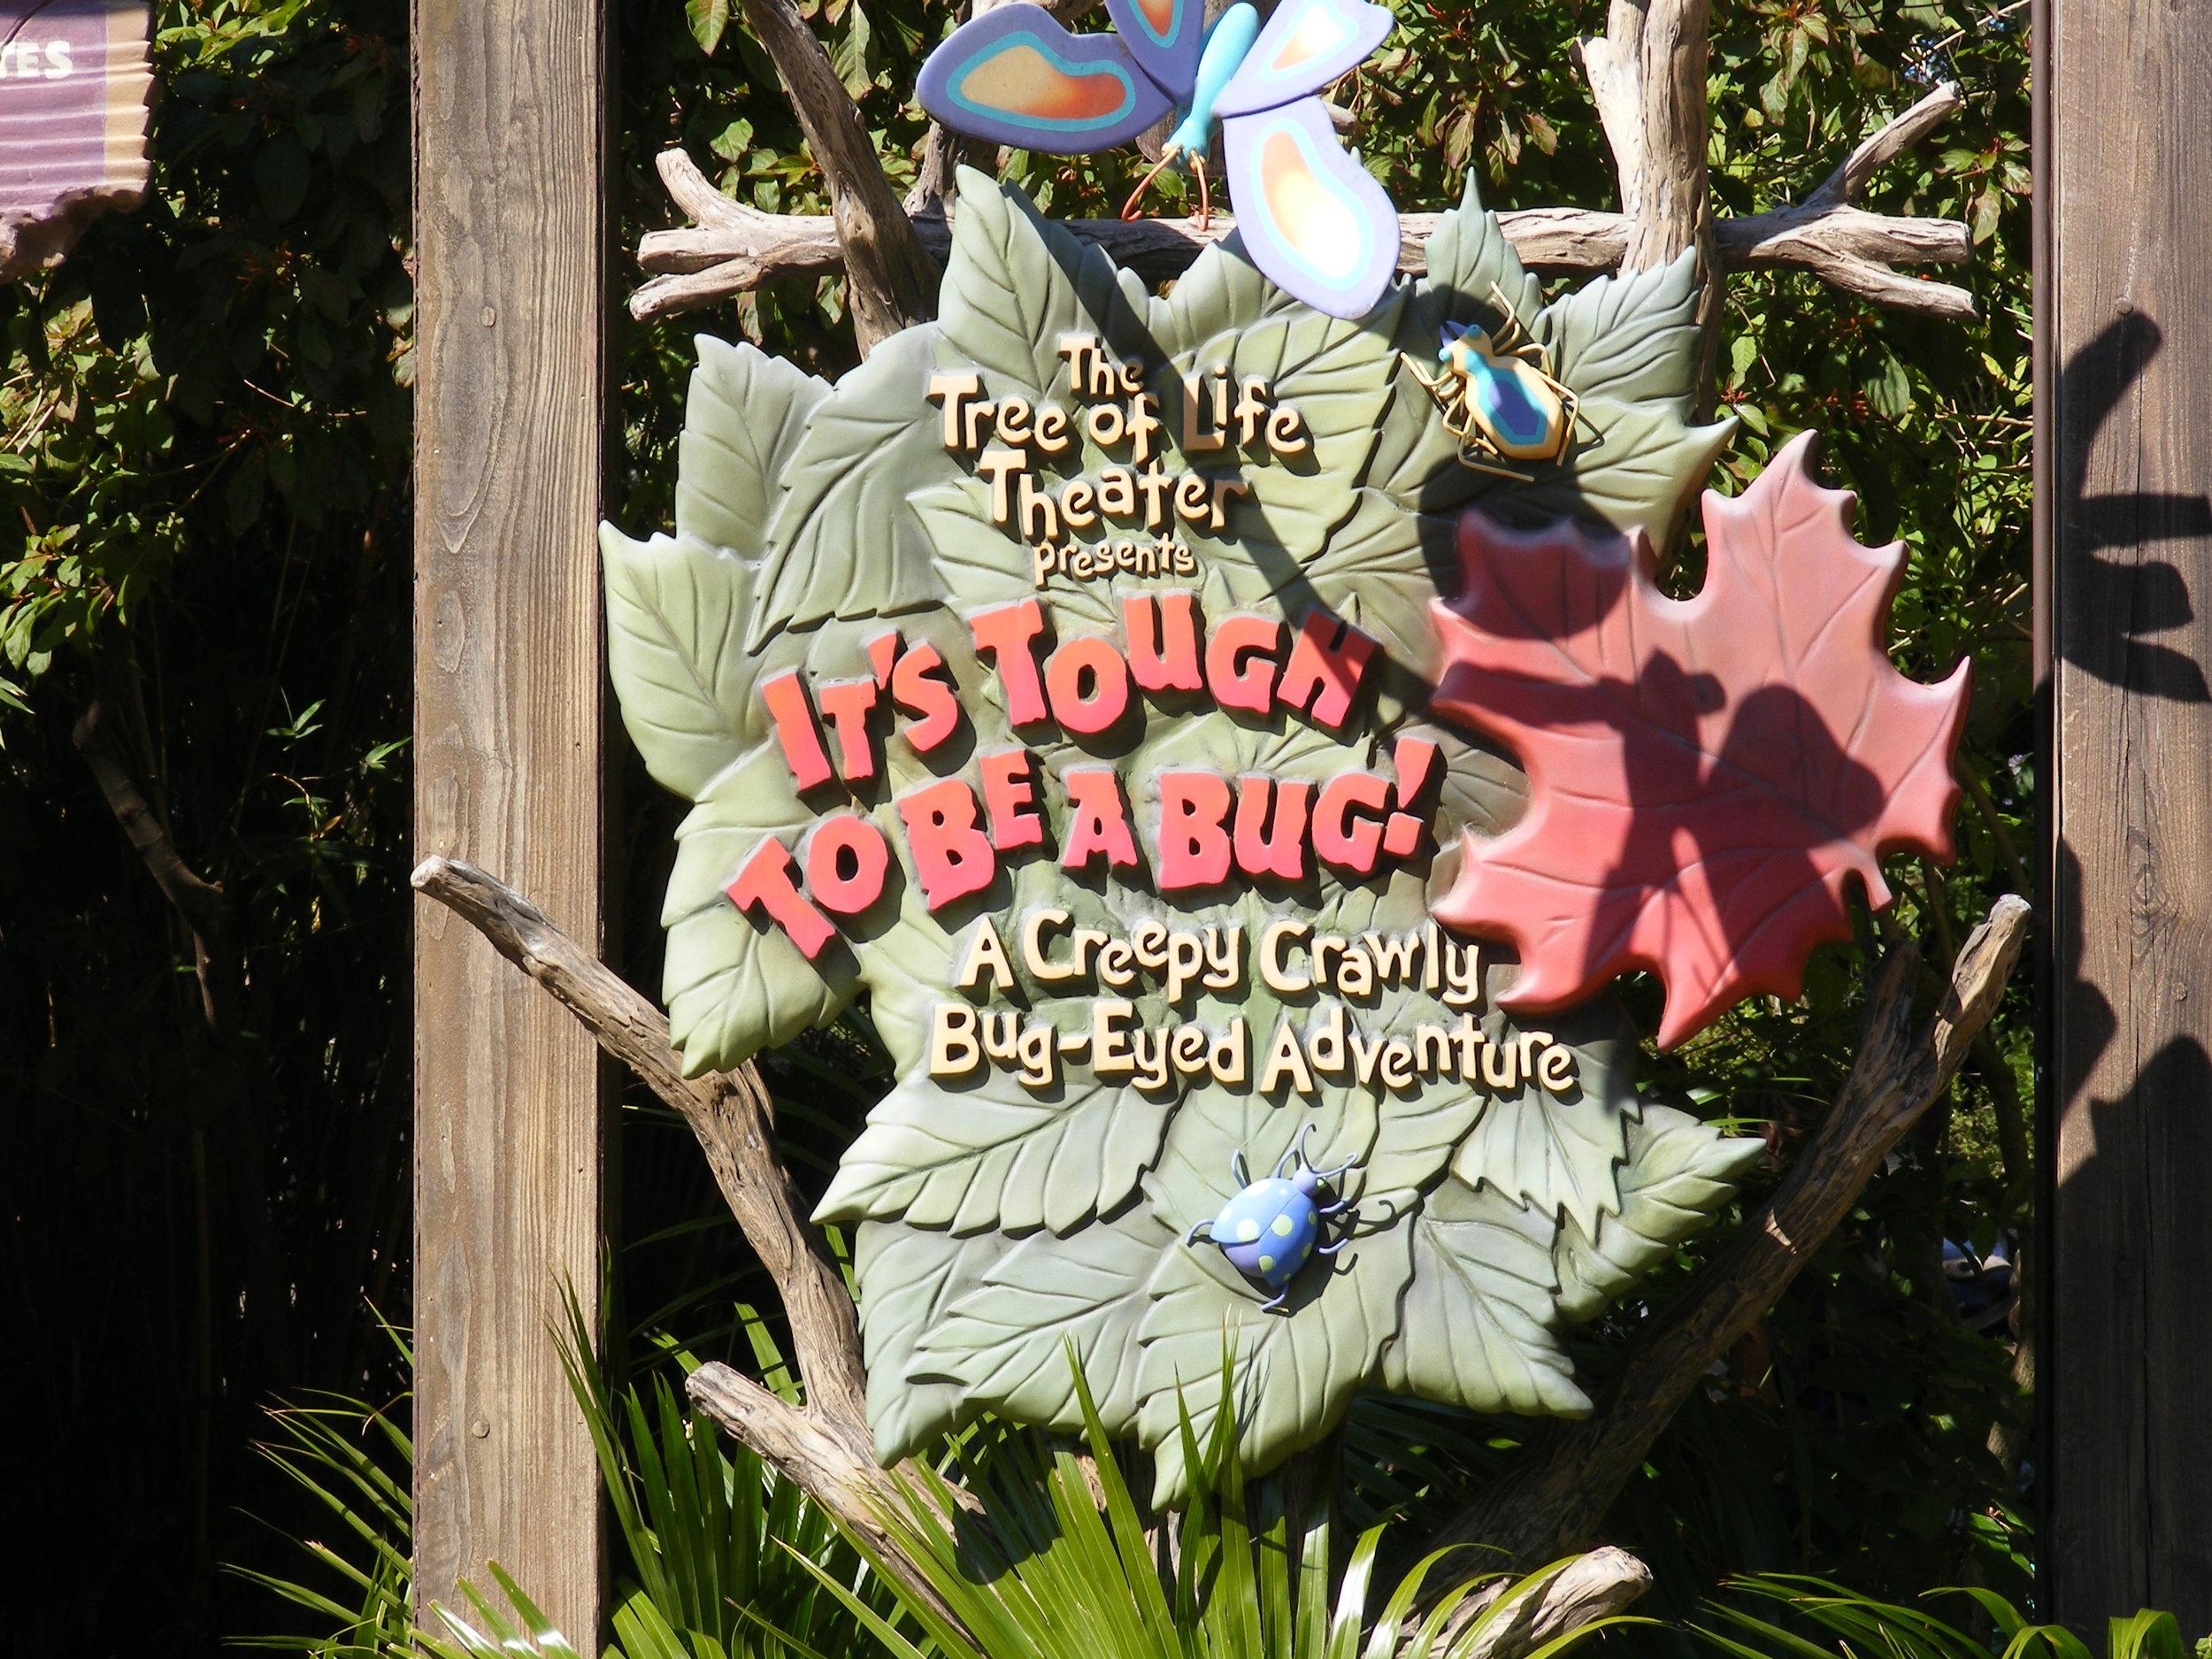 It's Tough To Be A Bug, Discovery Island, Disney's Animal Kingdom